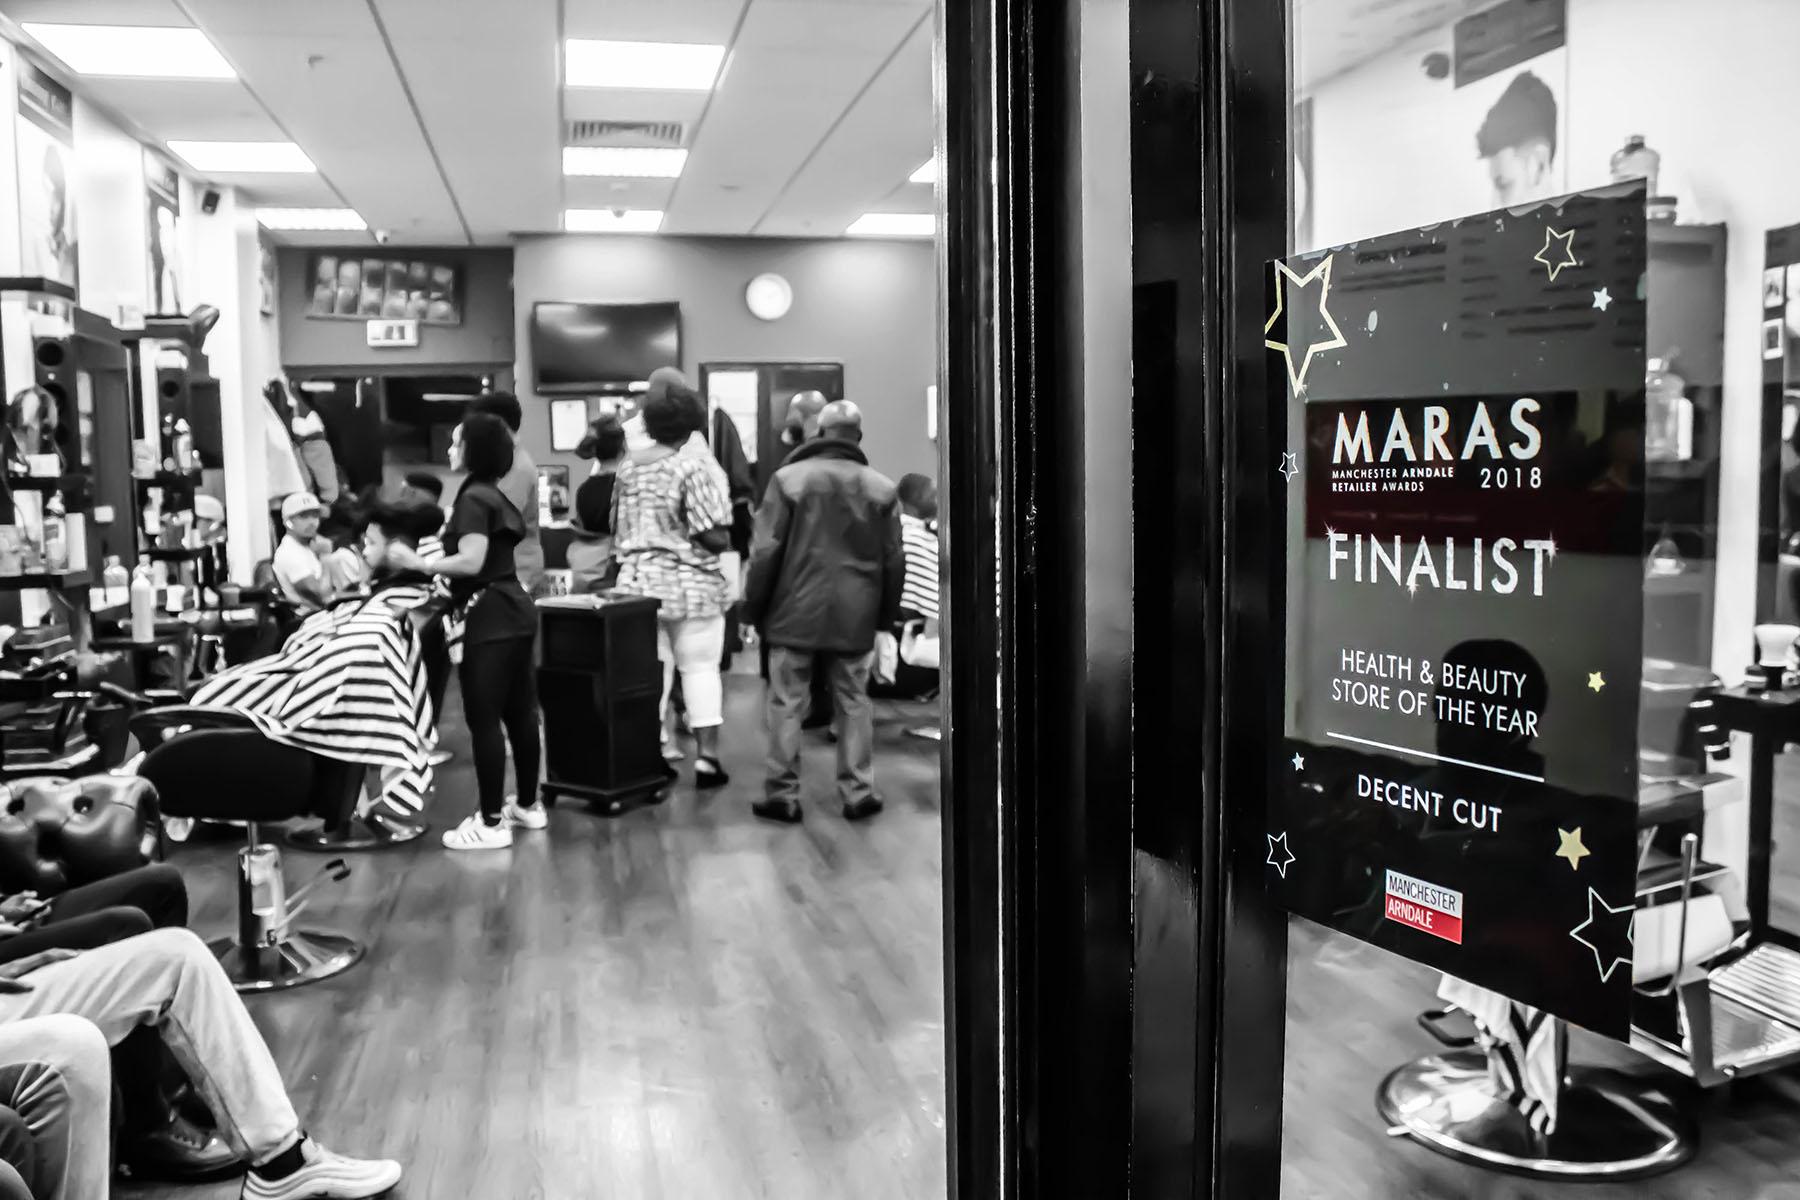 MARAS (Manchester Arndale Retail Awards) 2018